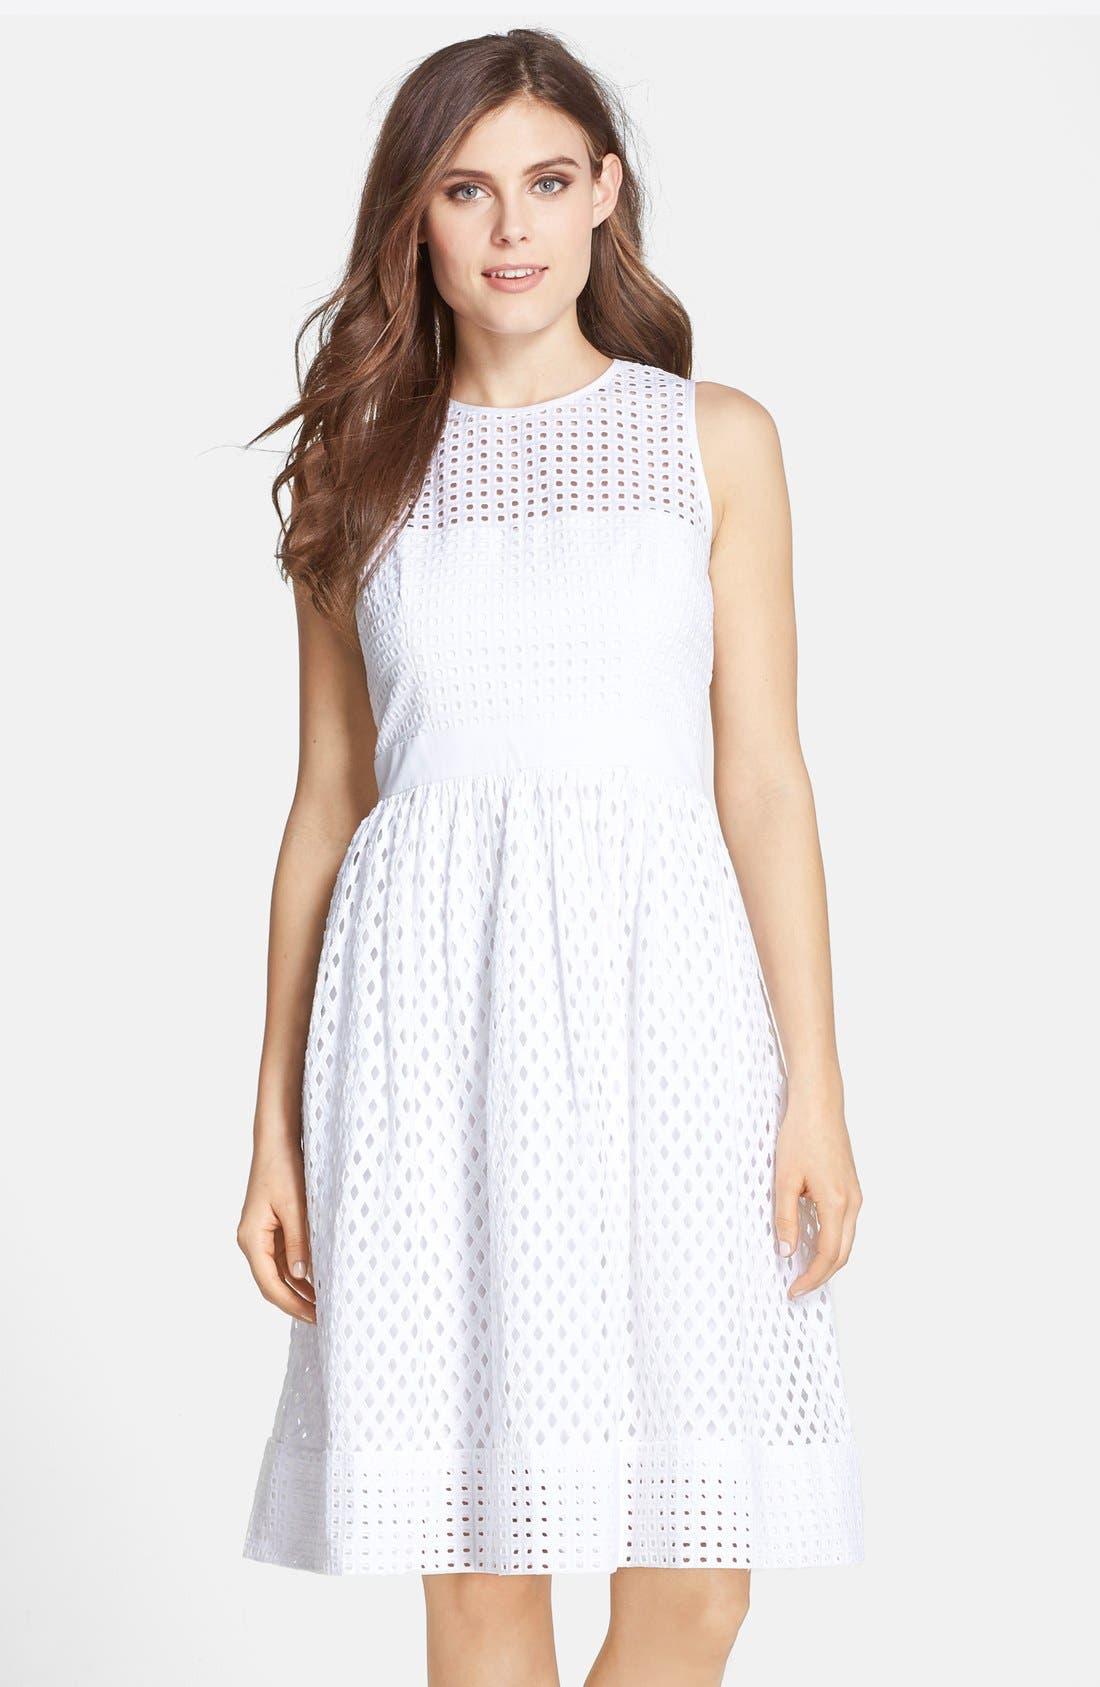 Main Image - Eliza J Cotton Eyelet Fit & Flare Dress (Regular & Petite)